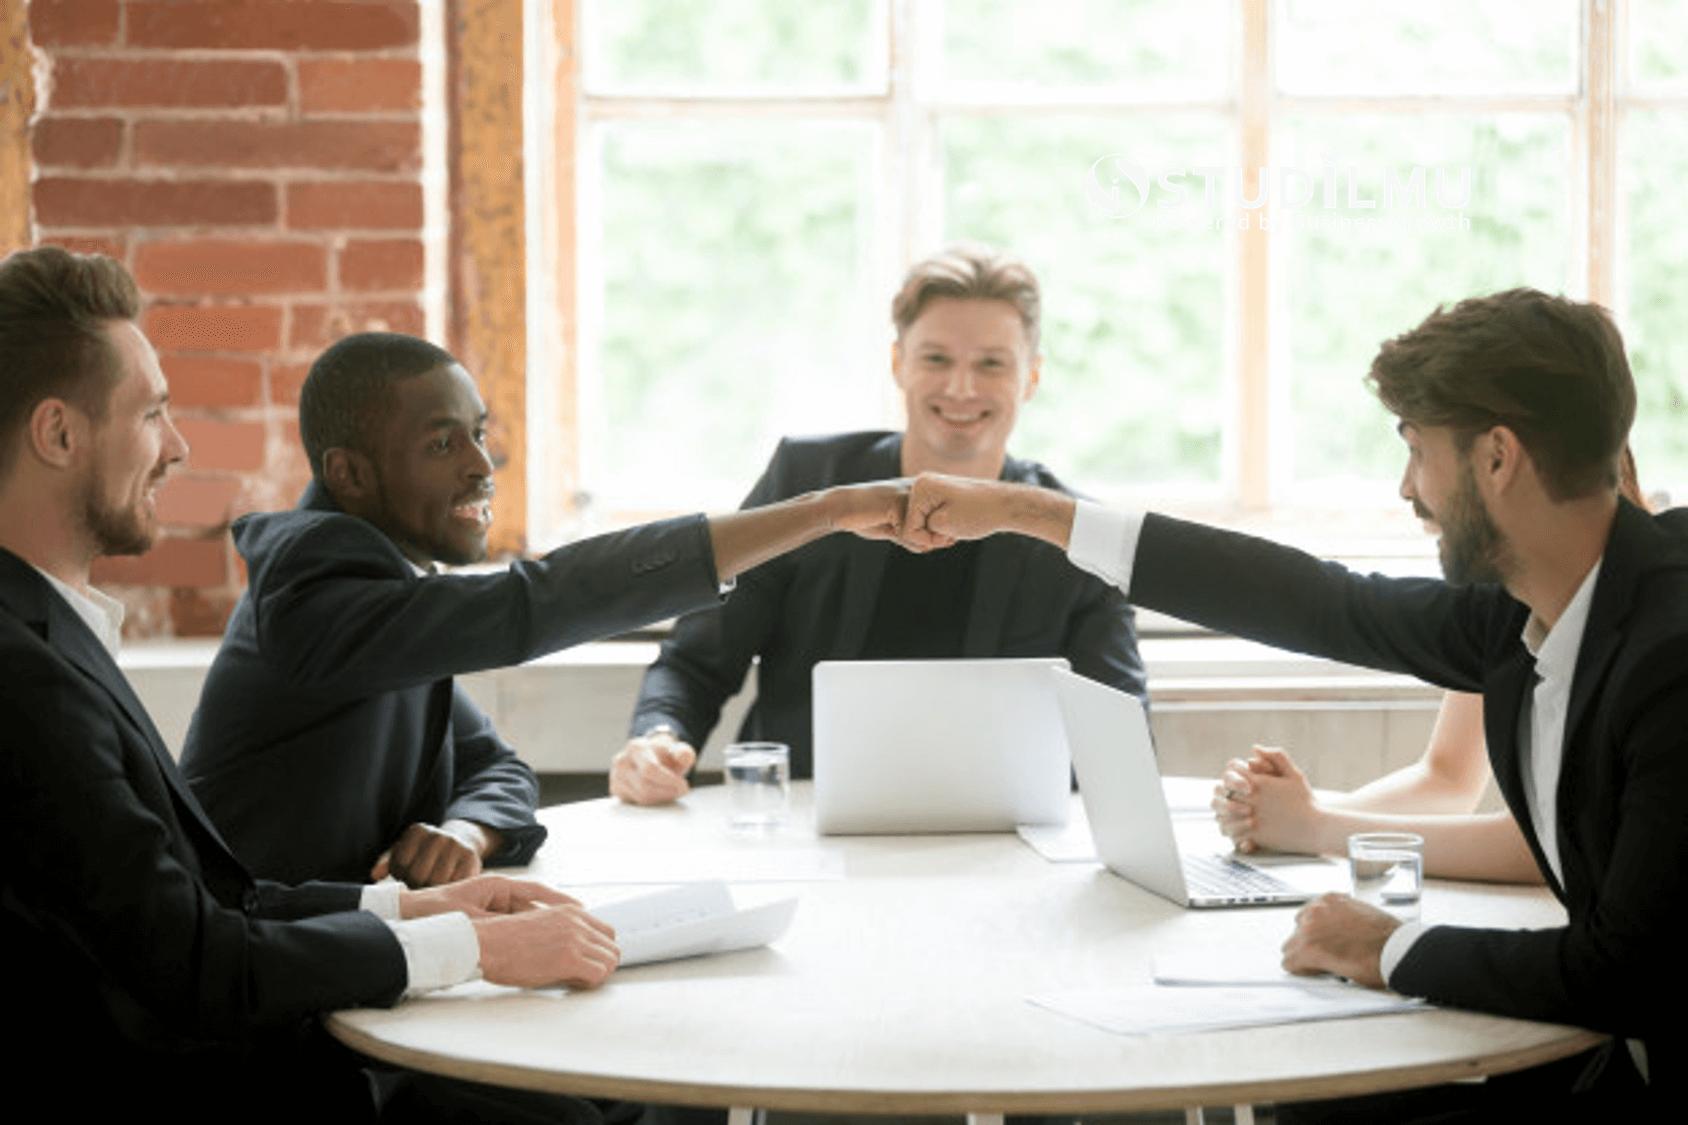 Mengenal Gaya Kepemimpinan dalam Organisasi dan 5 Keutamaannya